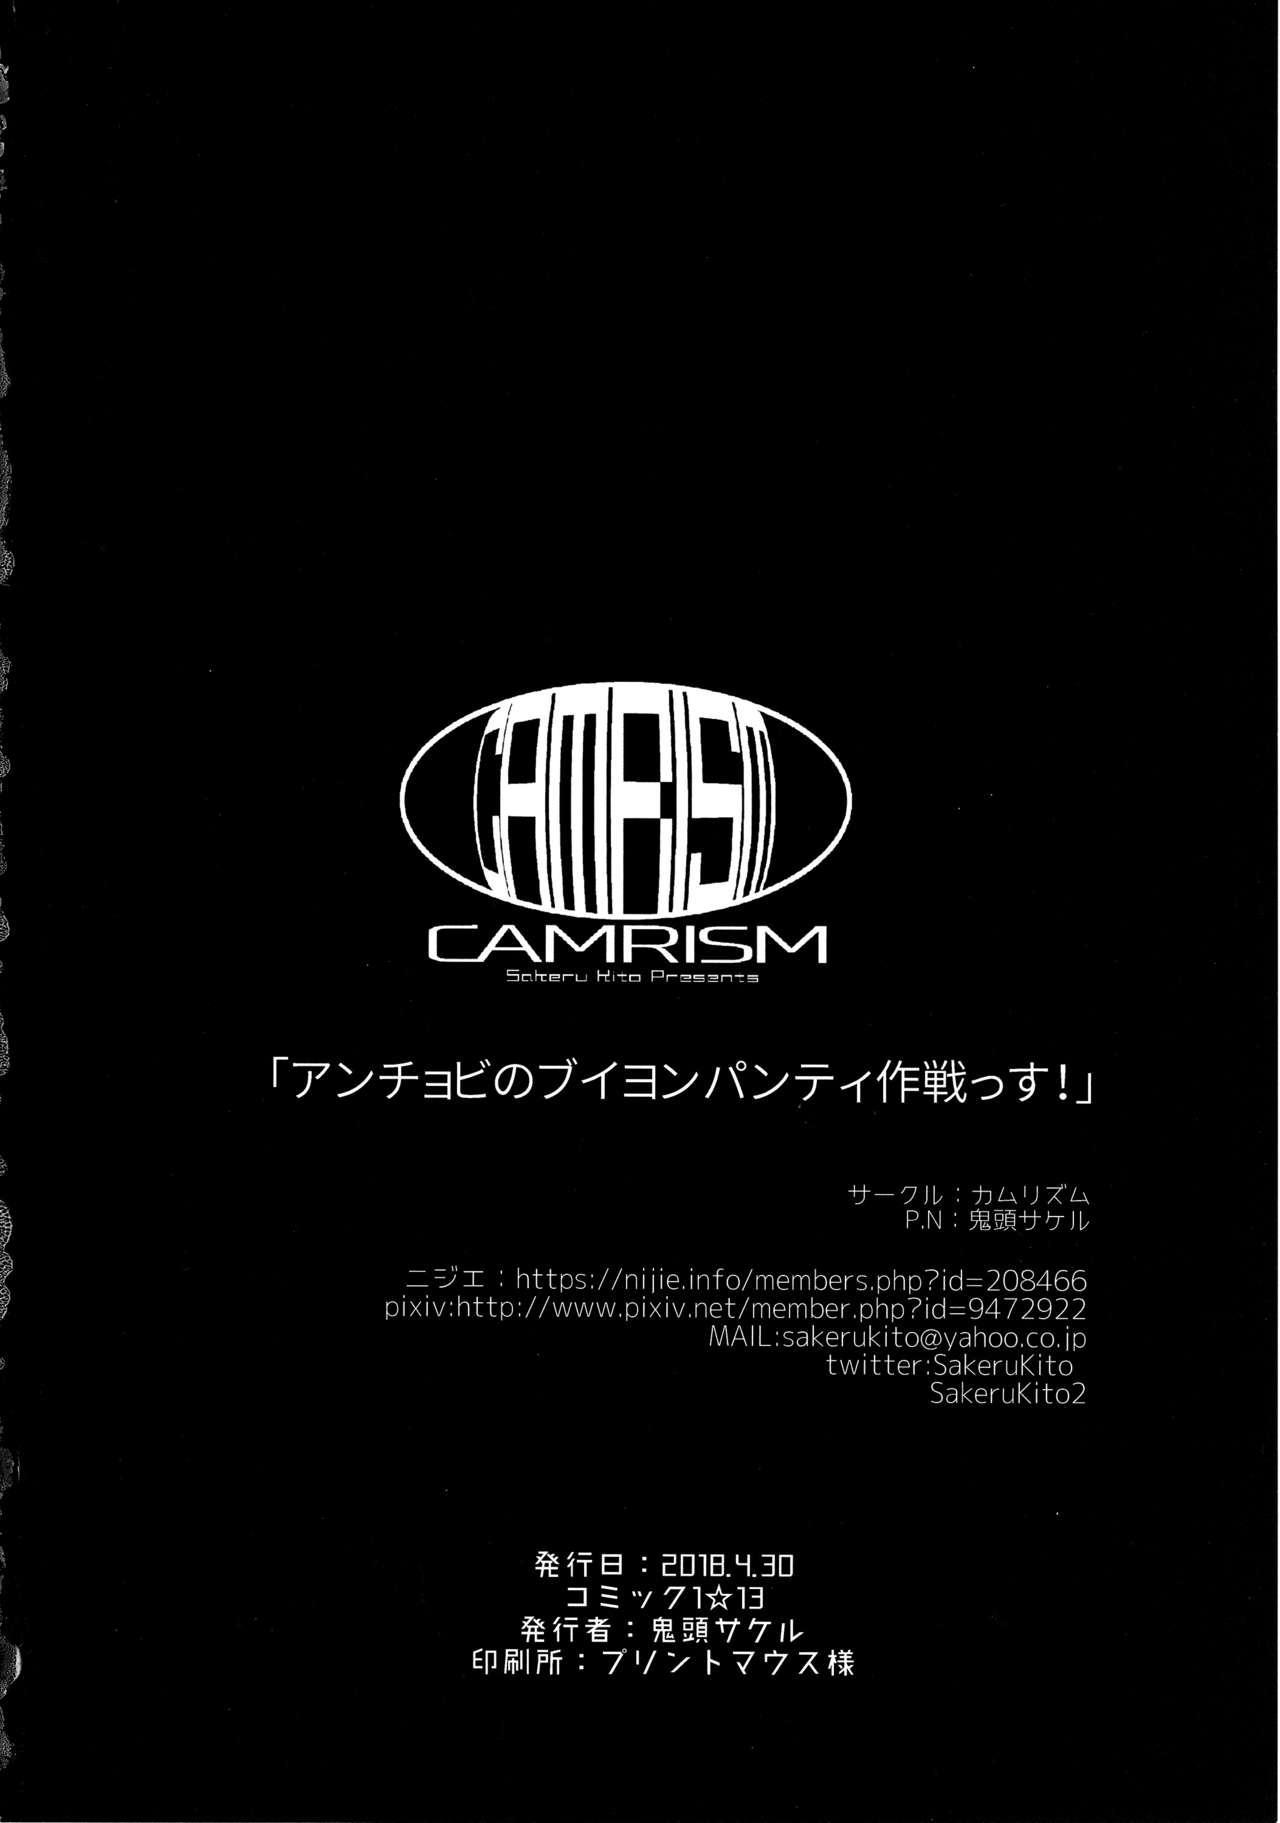 (COMIC1☆13) [Camrism (Kito Sakeru)] Anchovy Nee-san no Bouillon Panty Sakusen-ssu! (Girls und Panzer) [English] [DITSHICK] 23